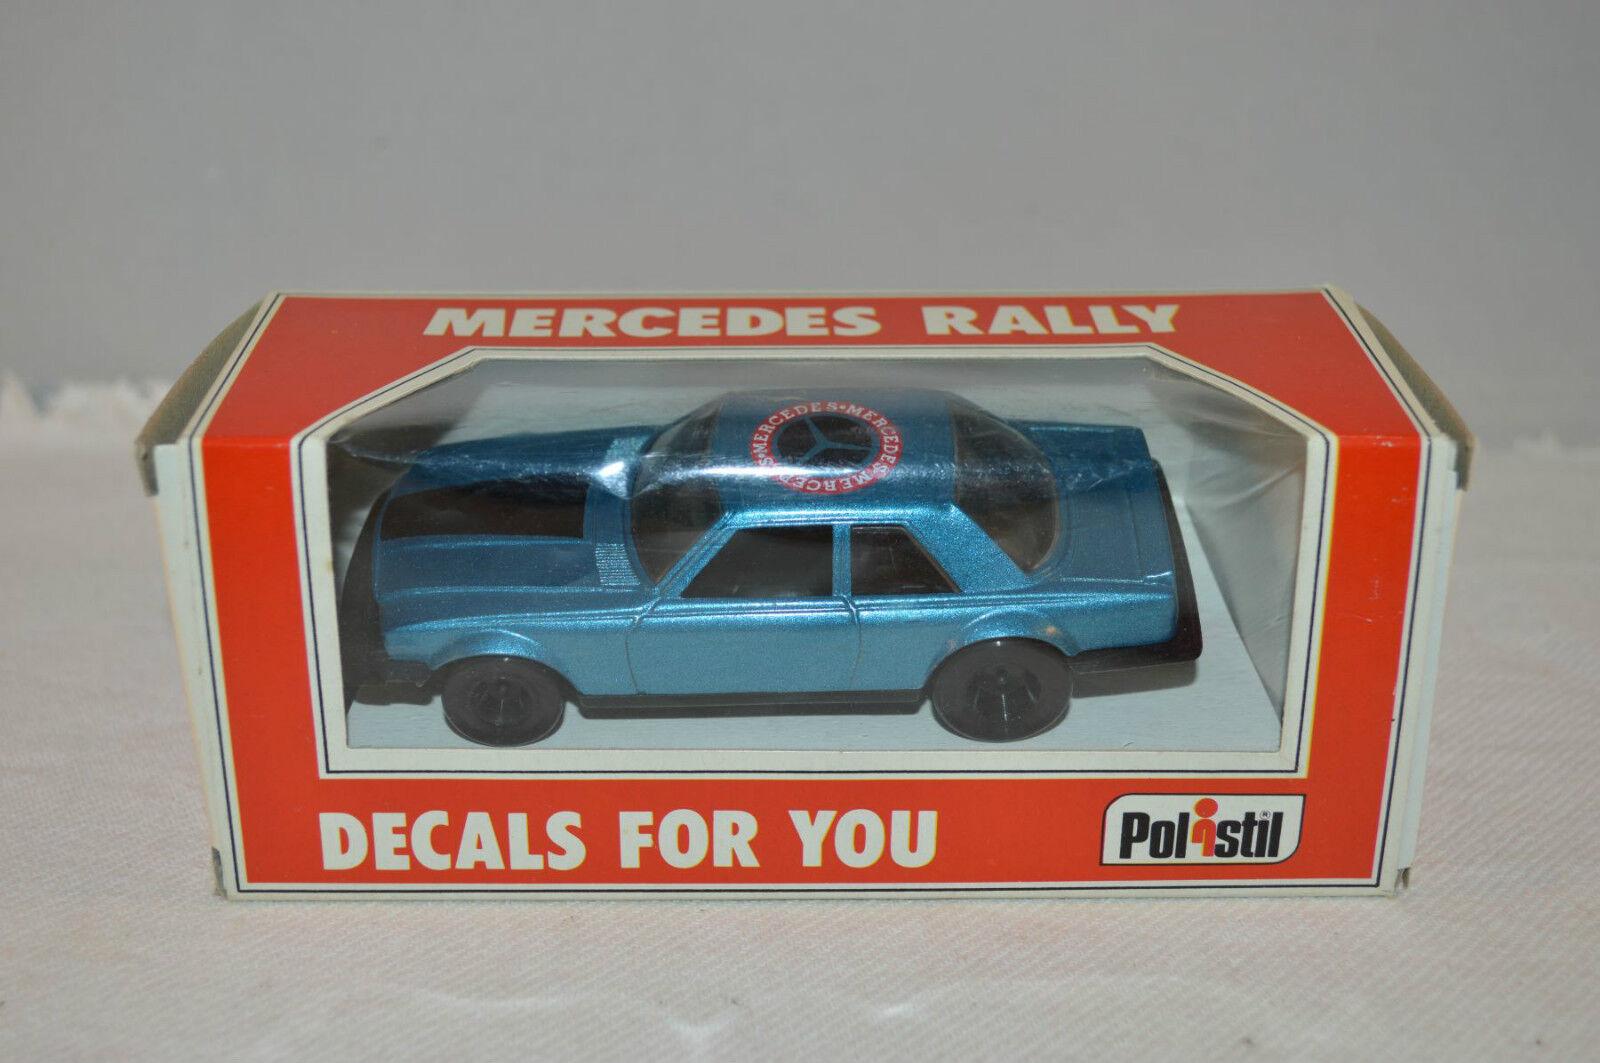 Polistil E2008 Mercedes Benz 280 Rally mint in box